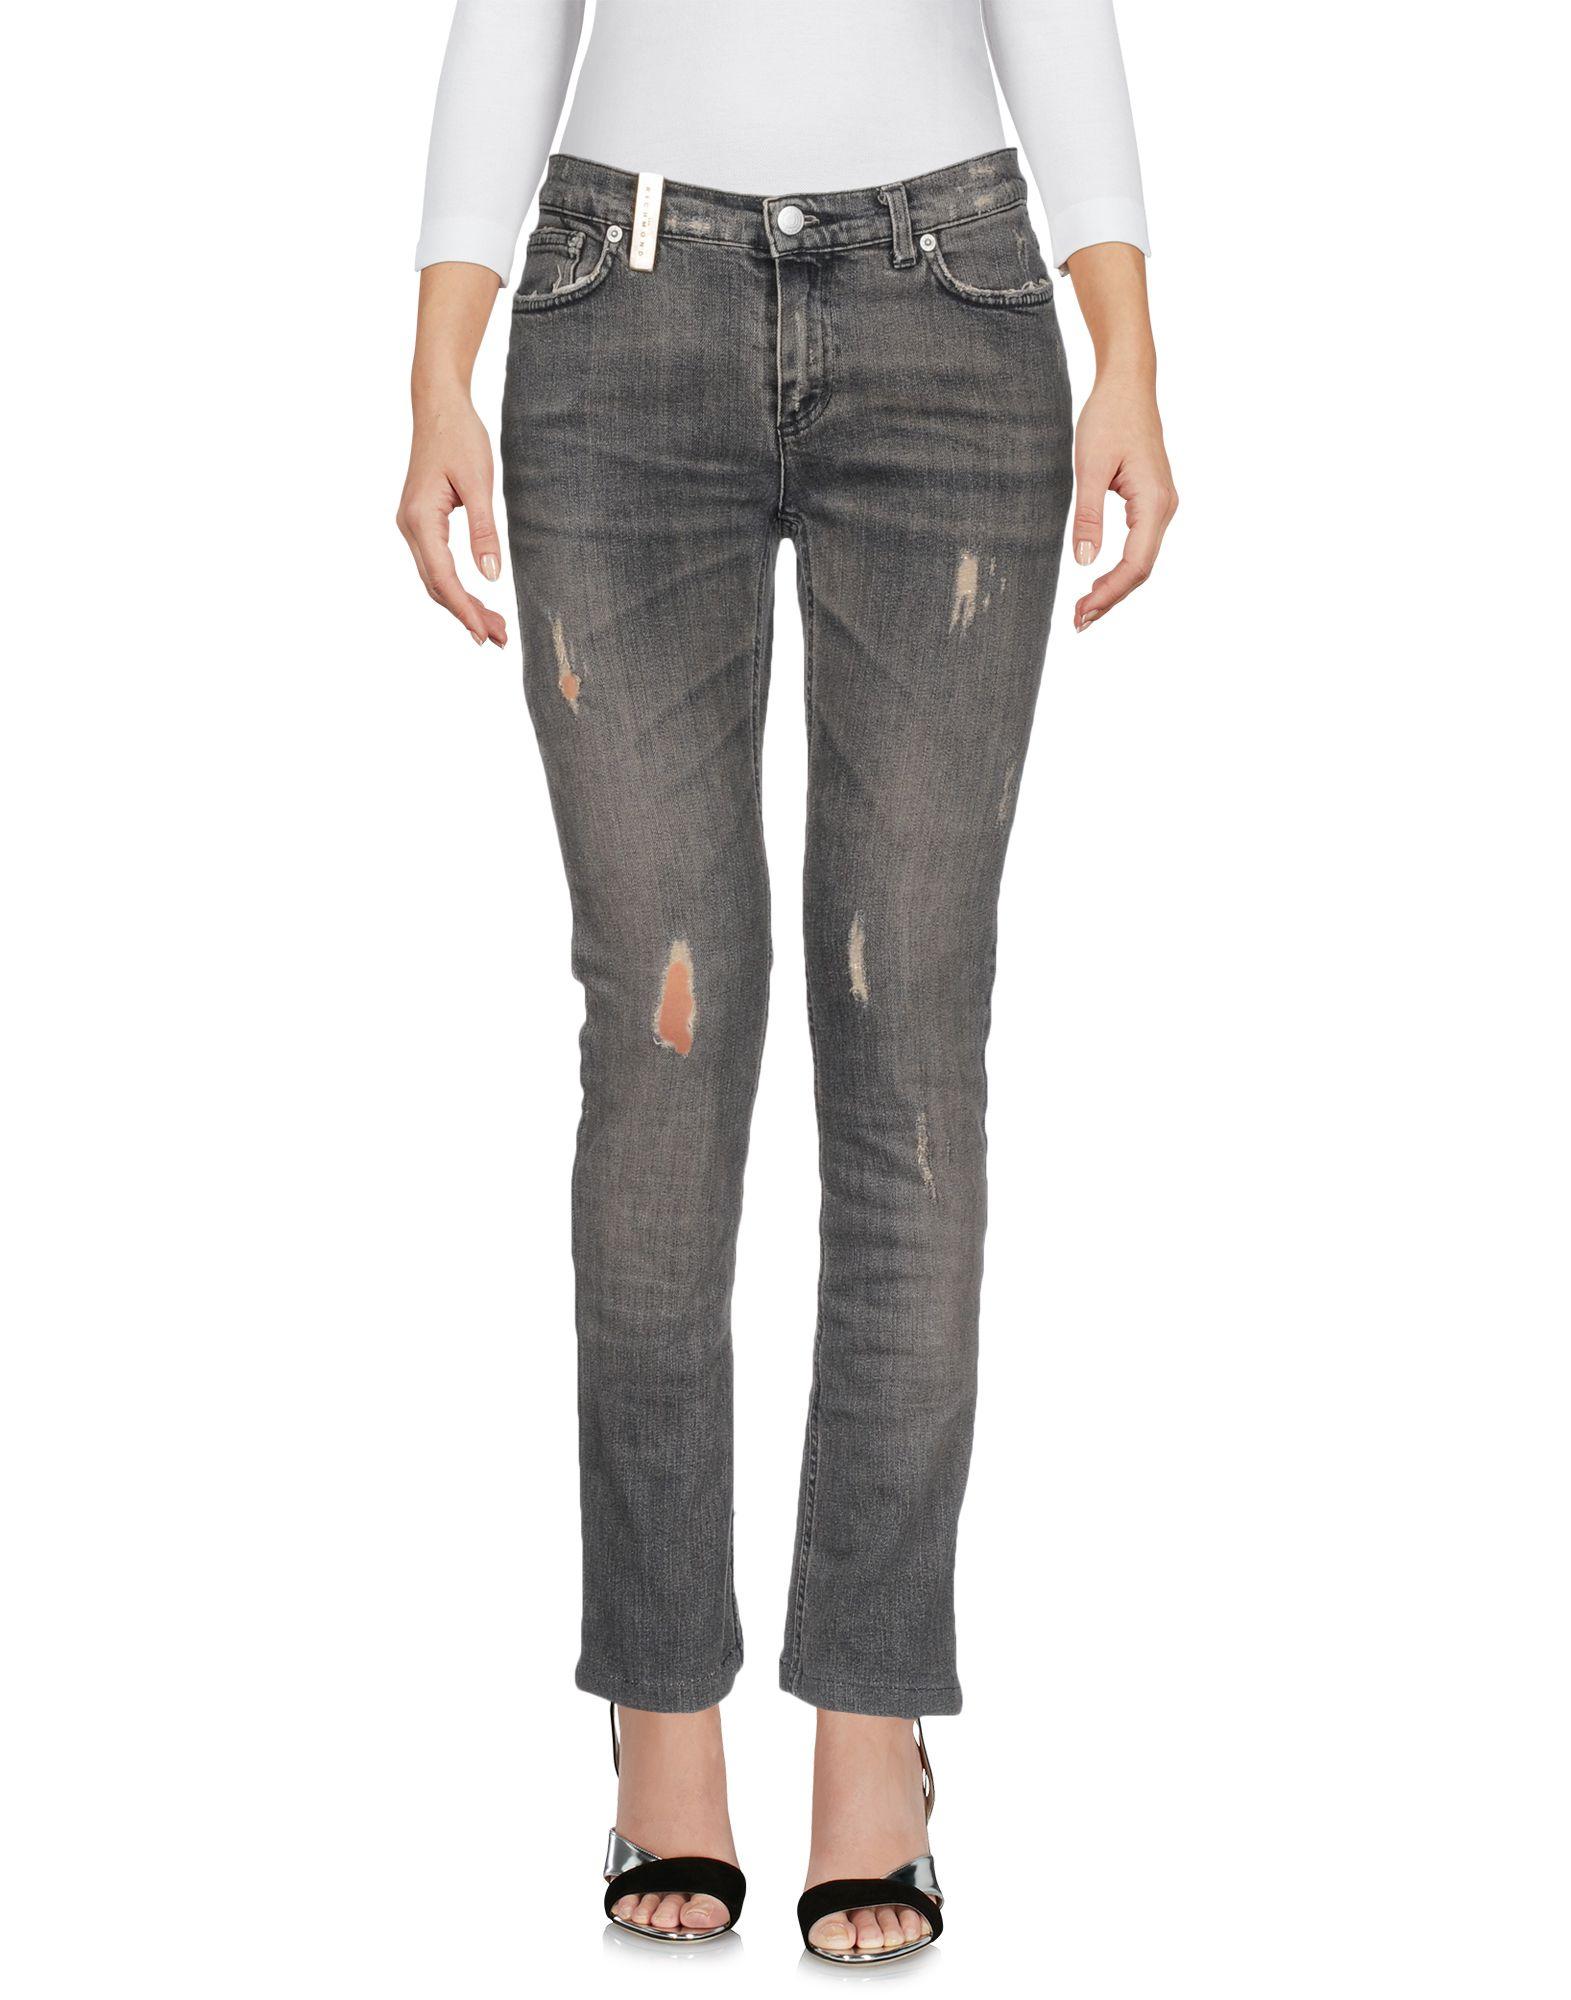 Pantaloni Jeans John Richmond donna - 42668013VH 42668013VH  billige Verkaufsstelle online